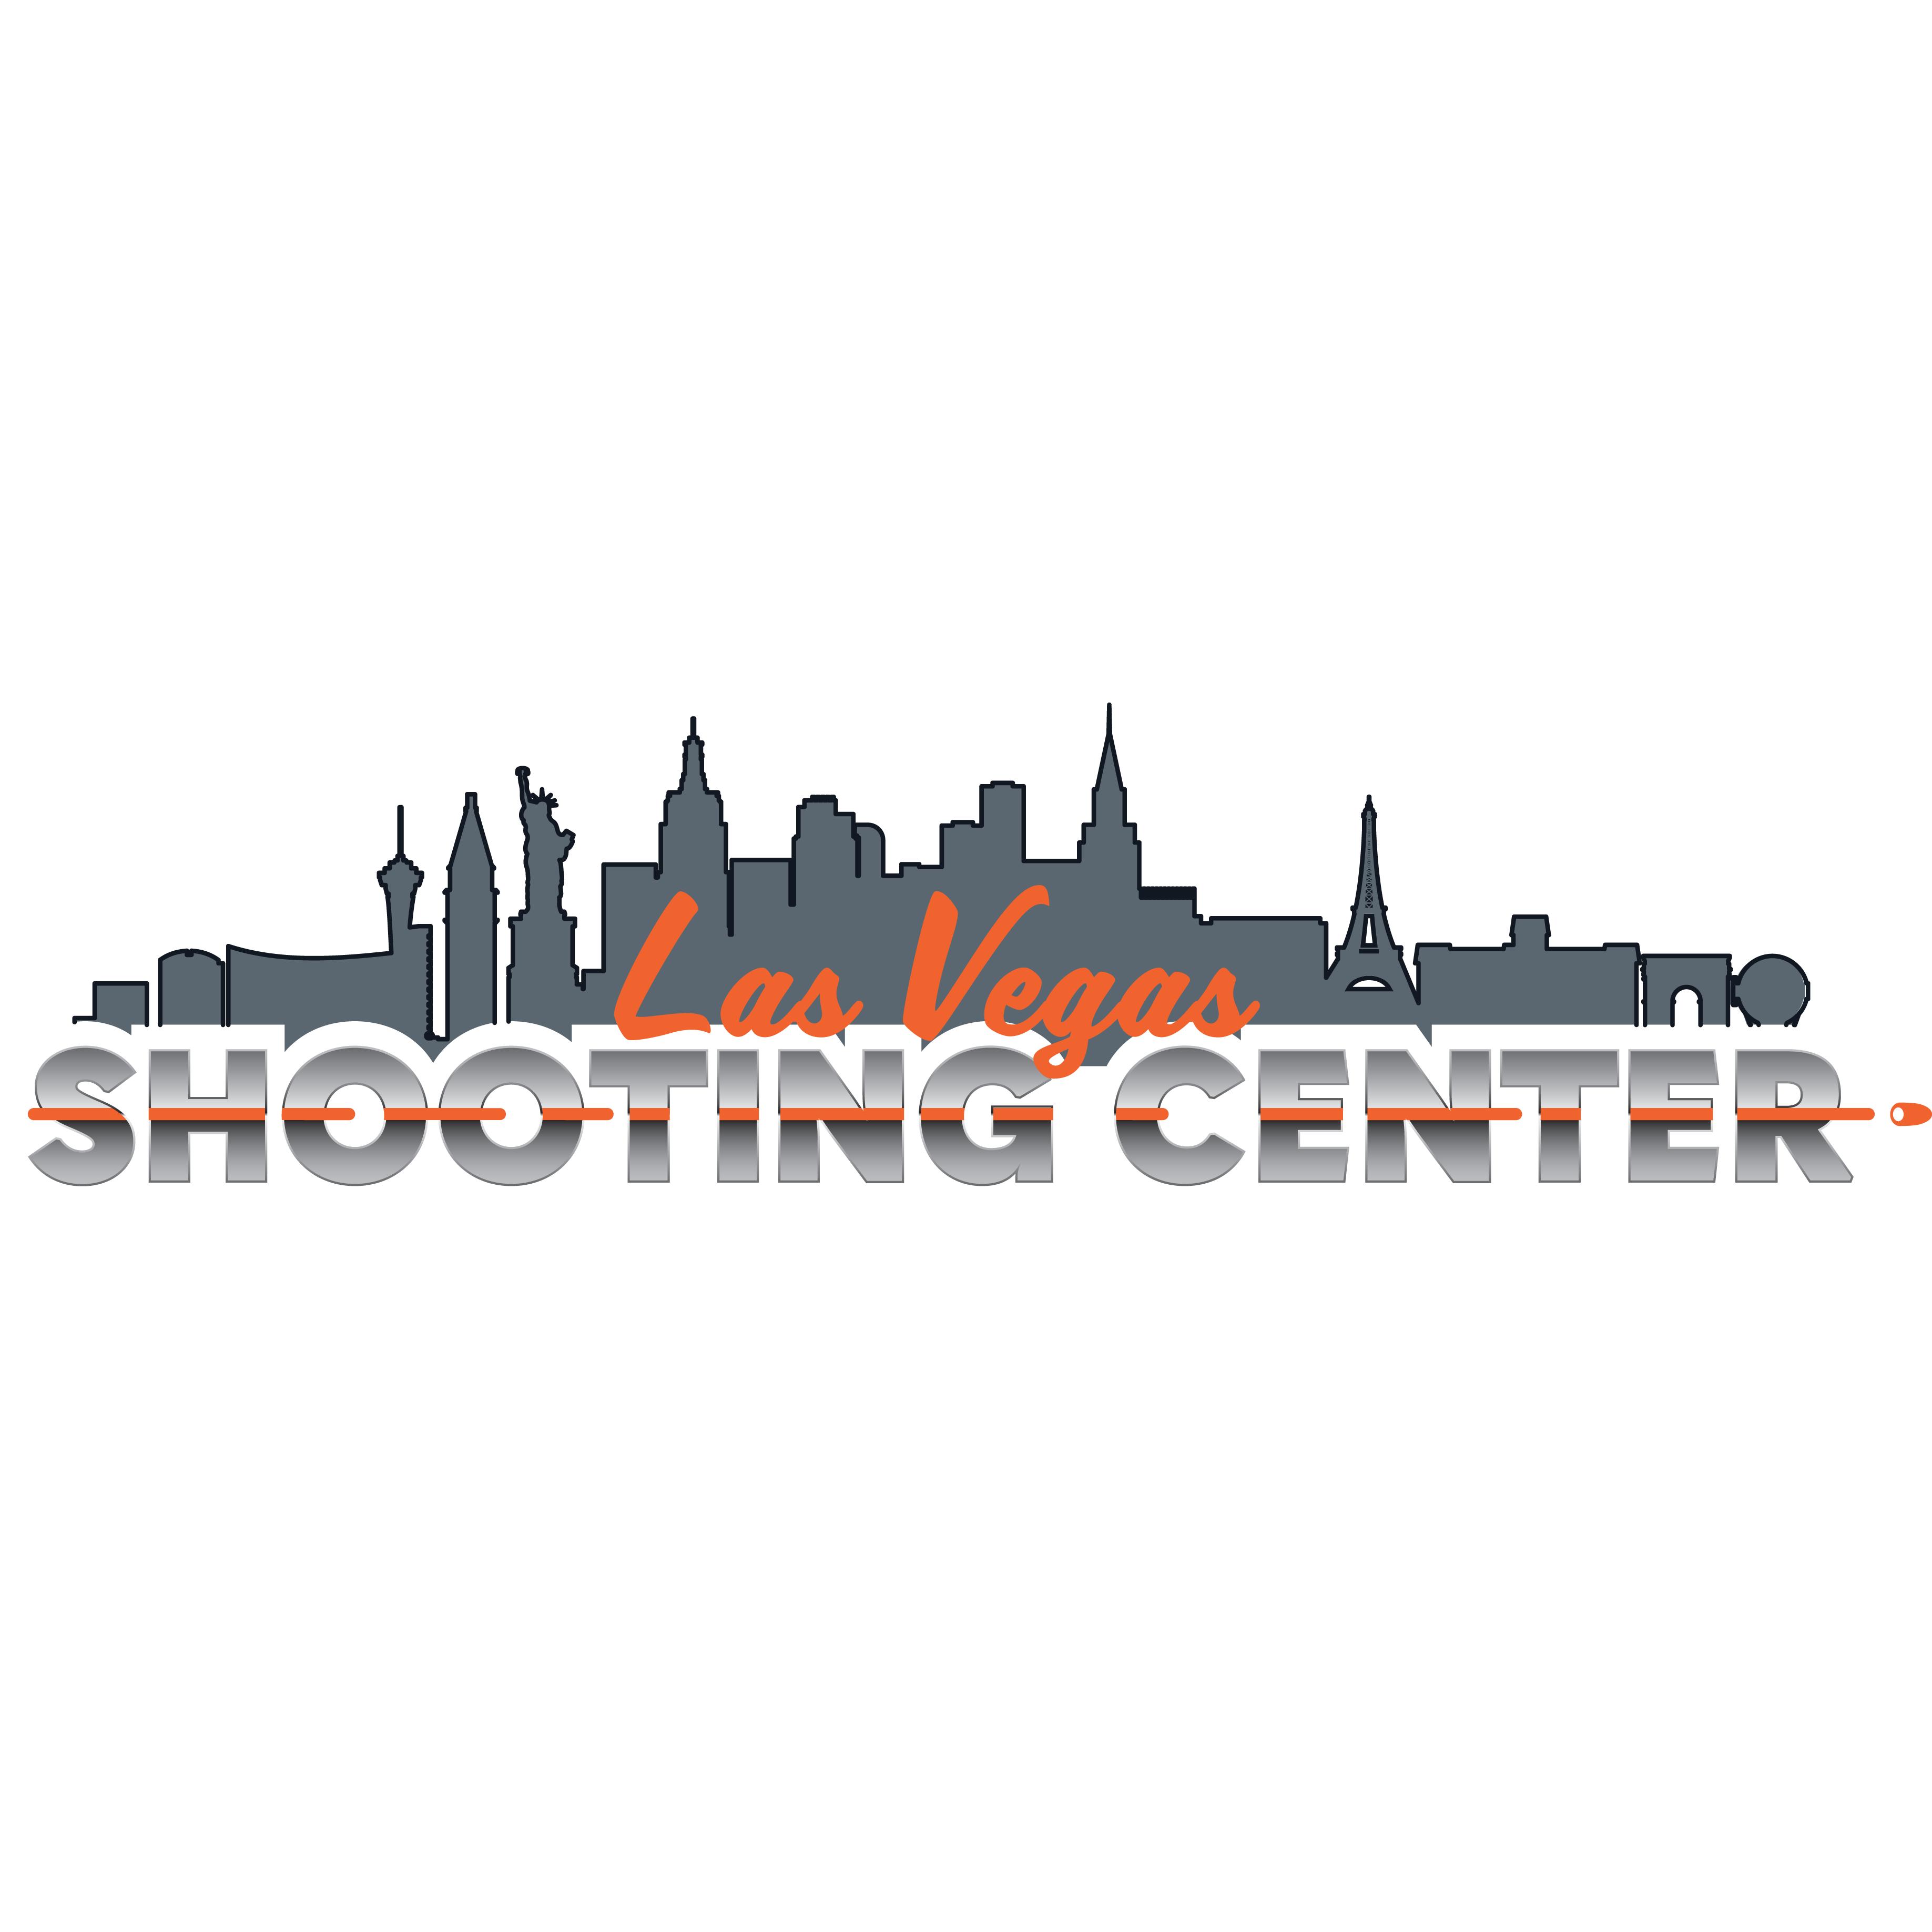 Las Vegas Shooting Center